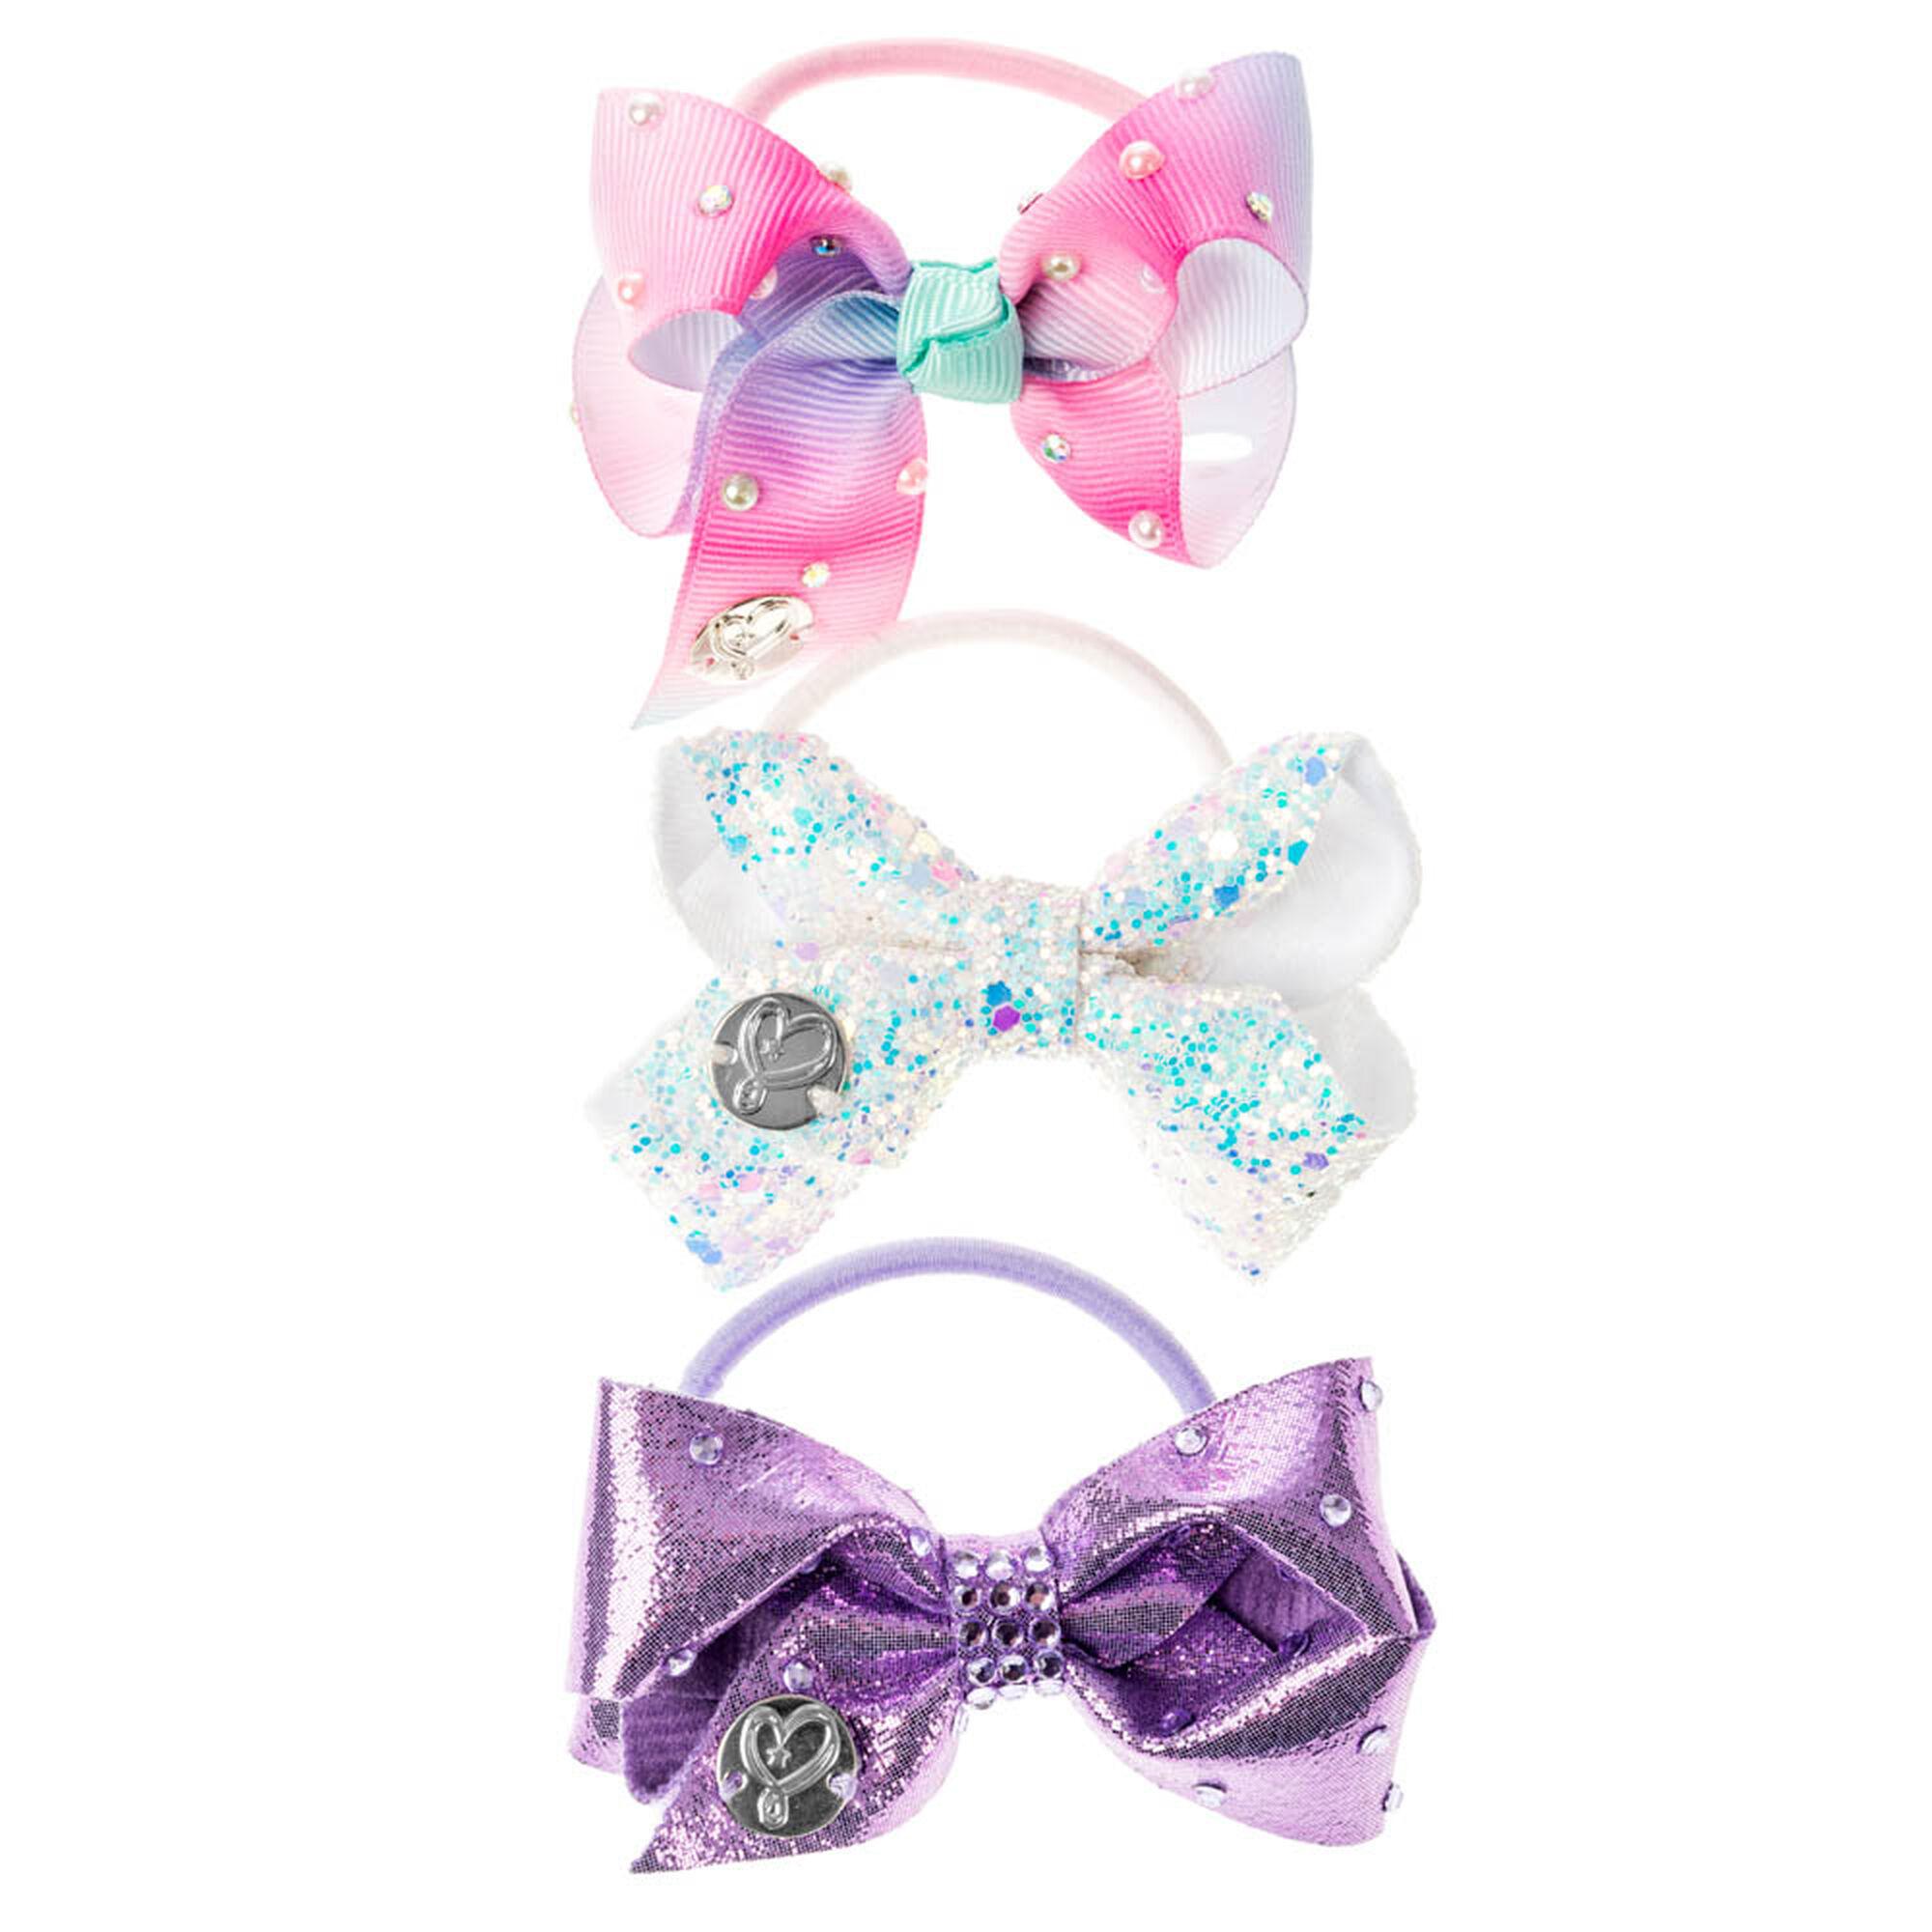 ... JoJo Siwa trade  Purple Mini Bow Hair Elastics ... 152743774dd